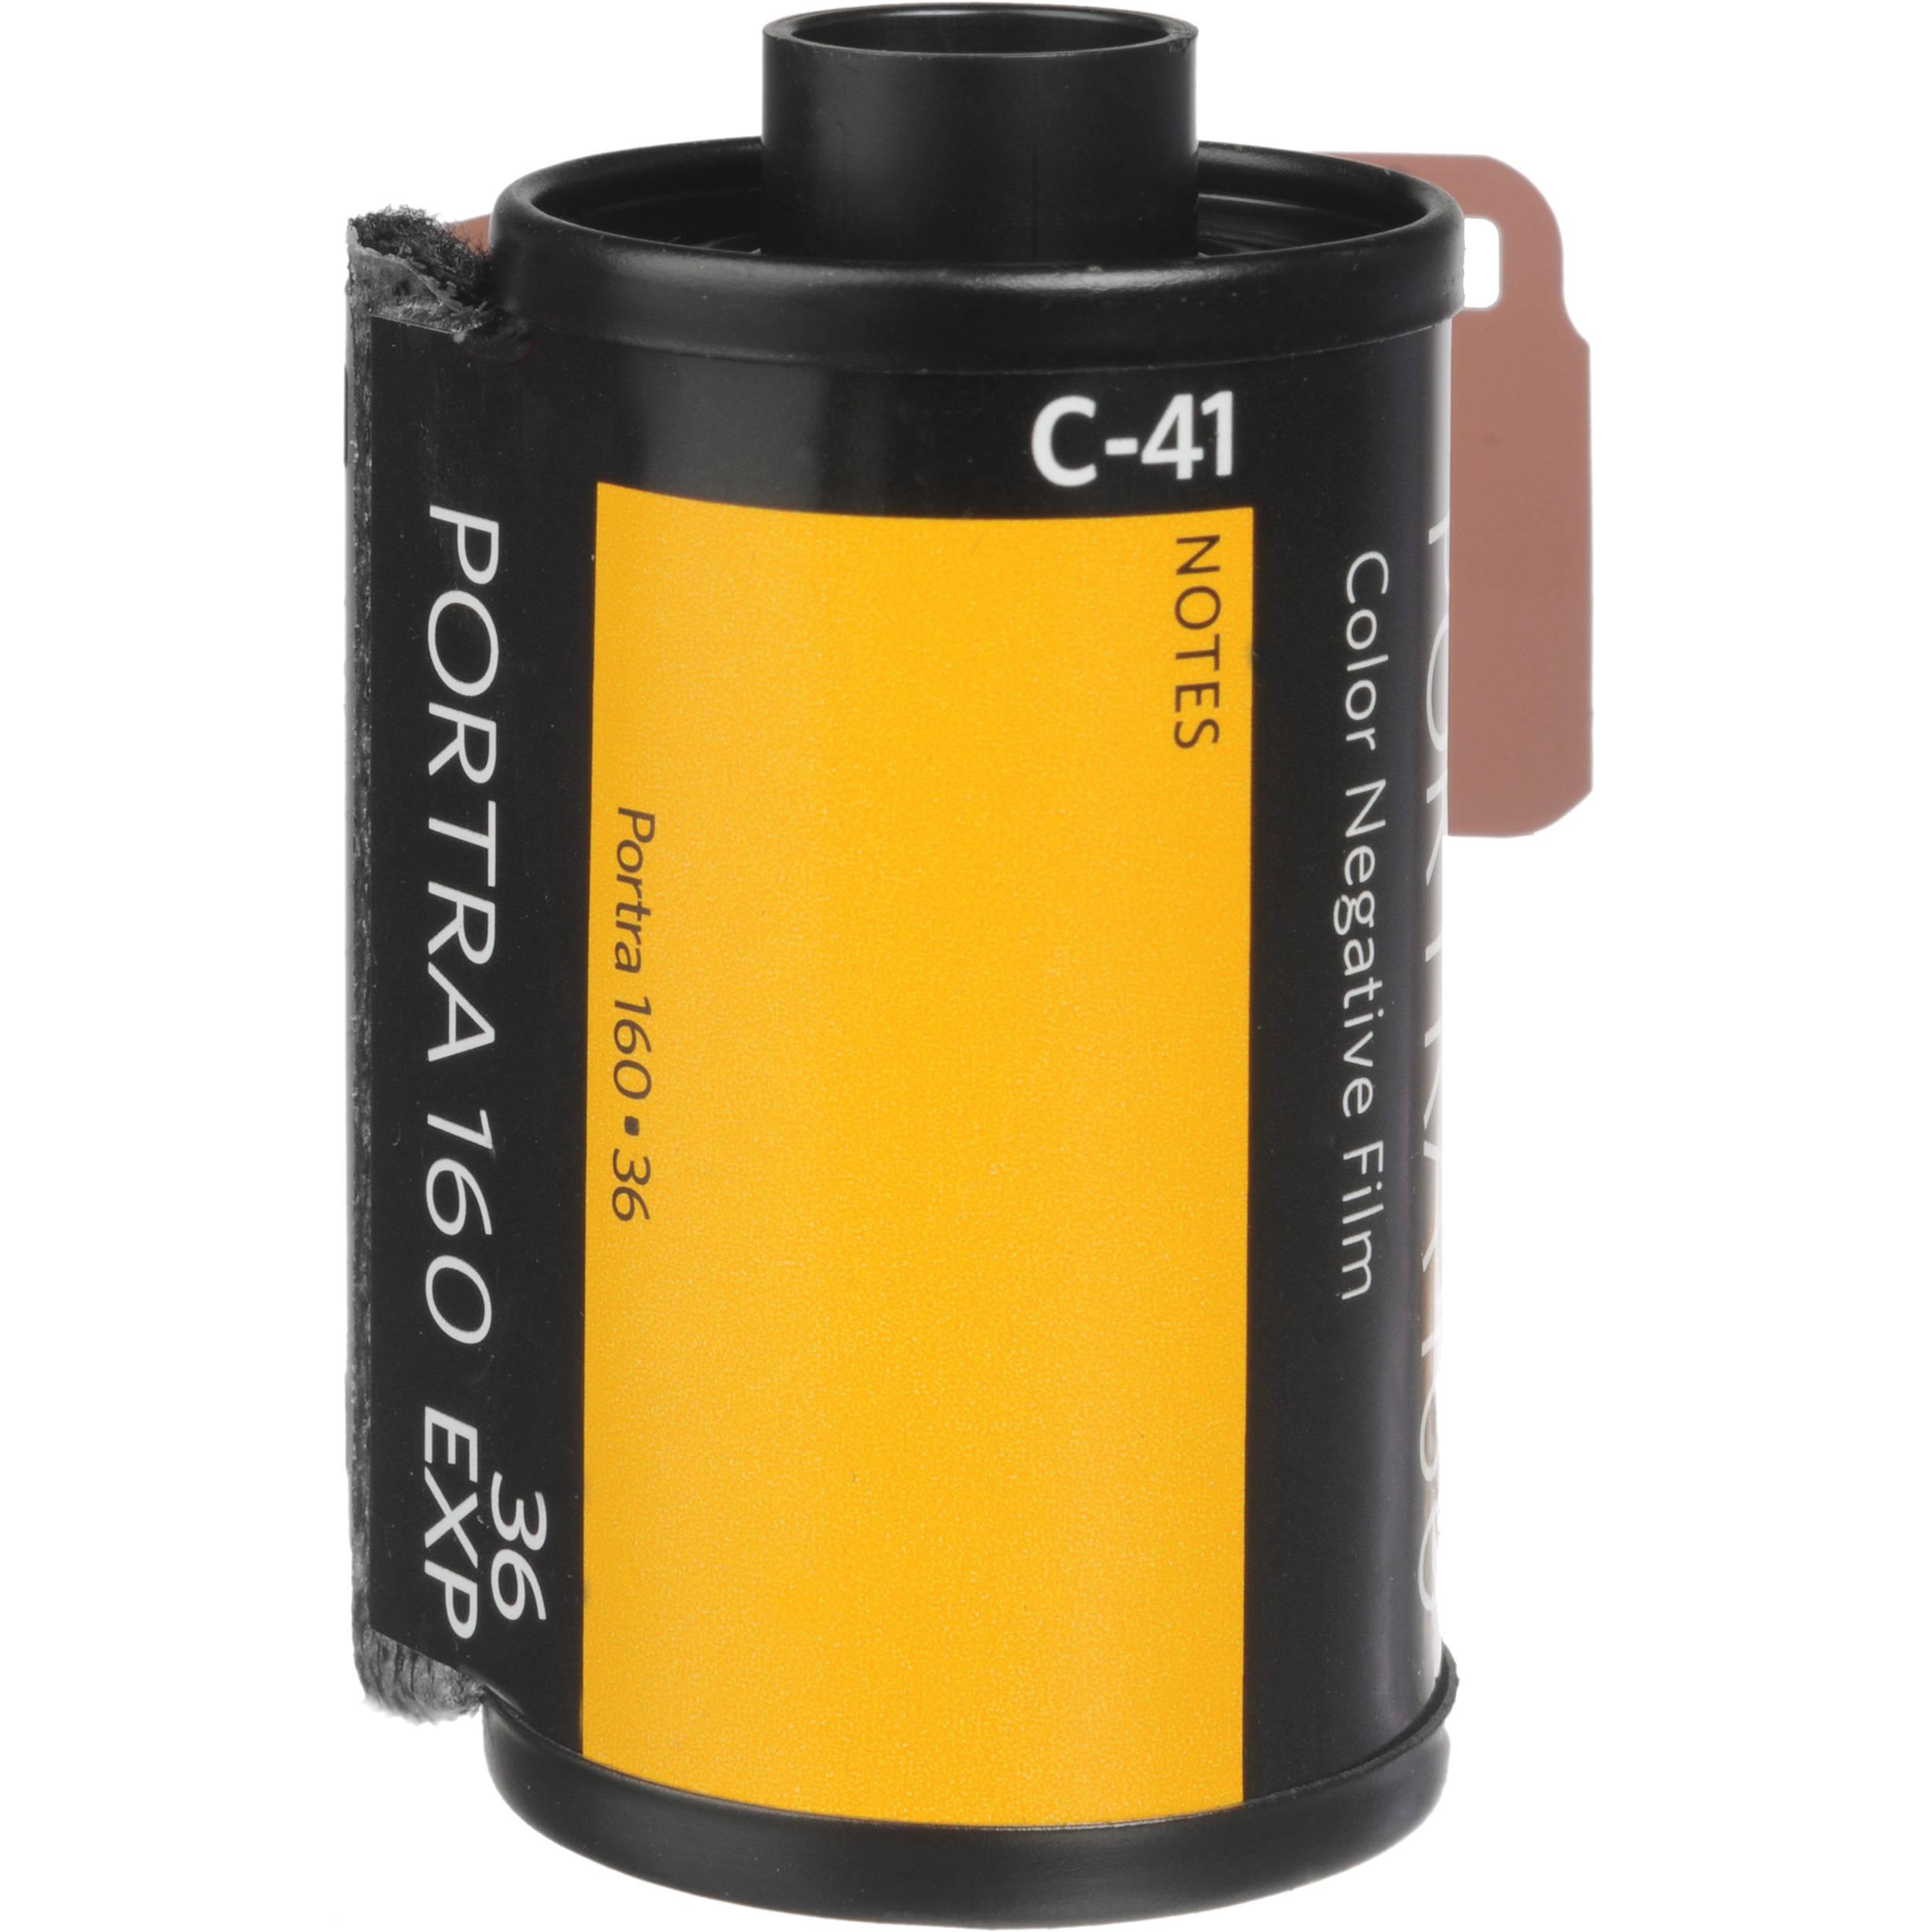 Kodak Professional Portra 160 Color Negative Film 6031959 ...